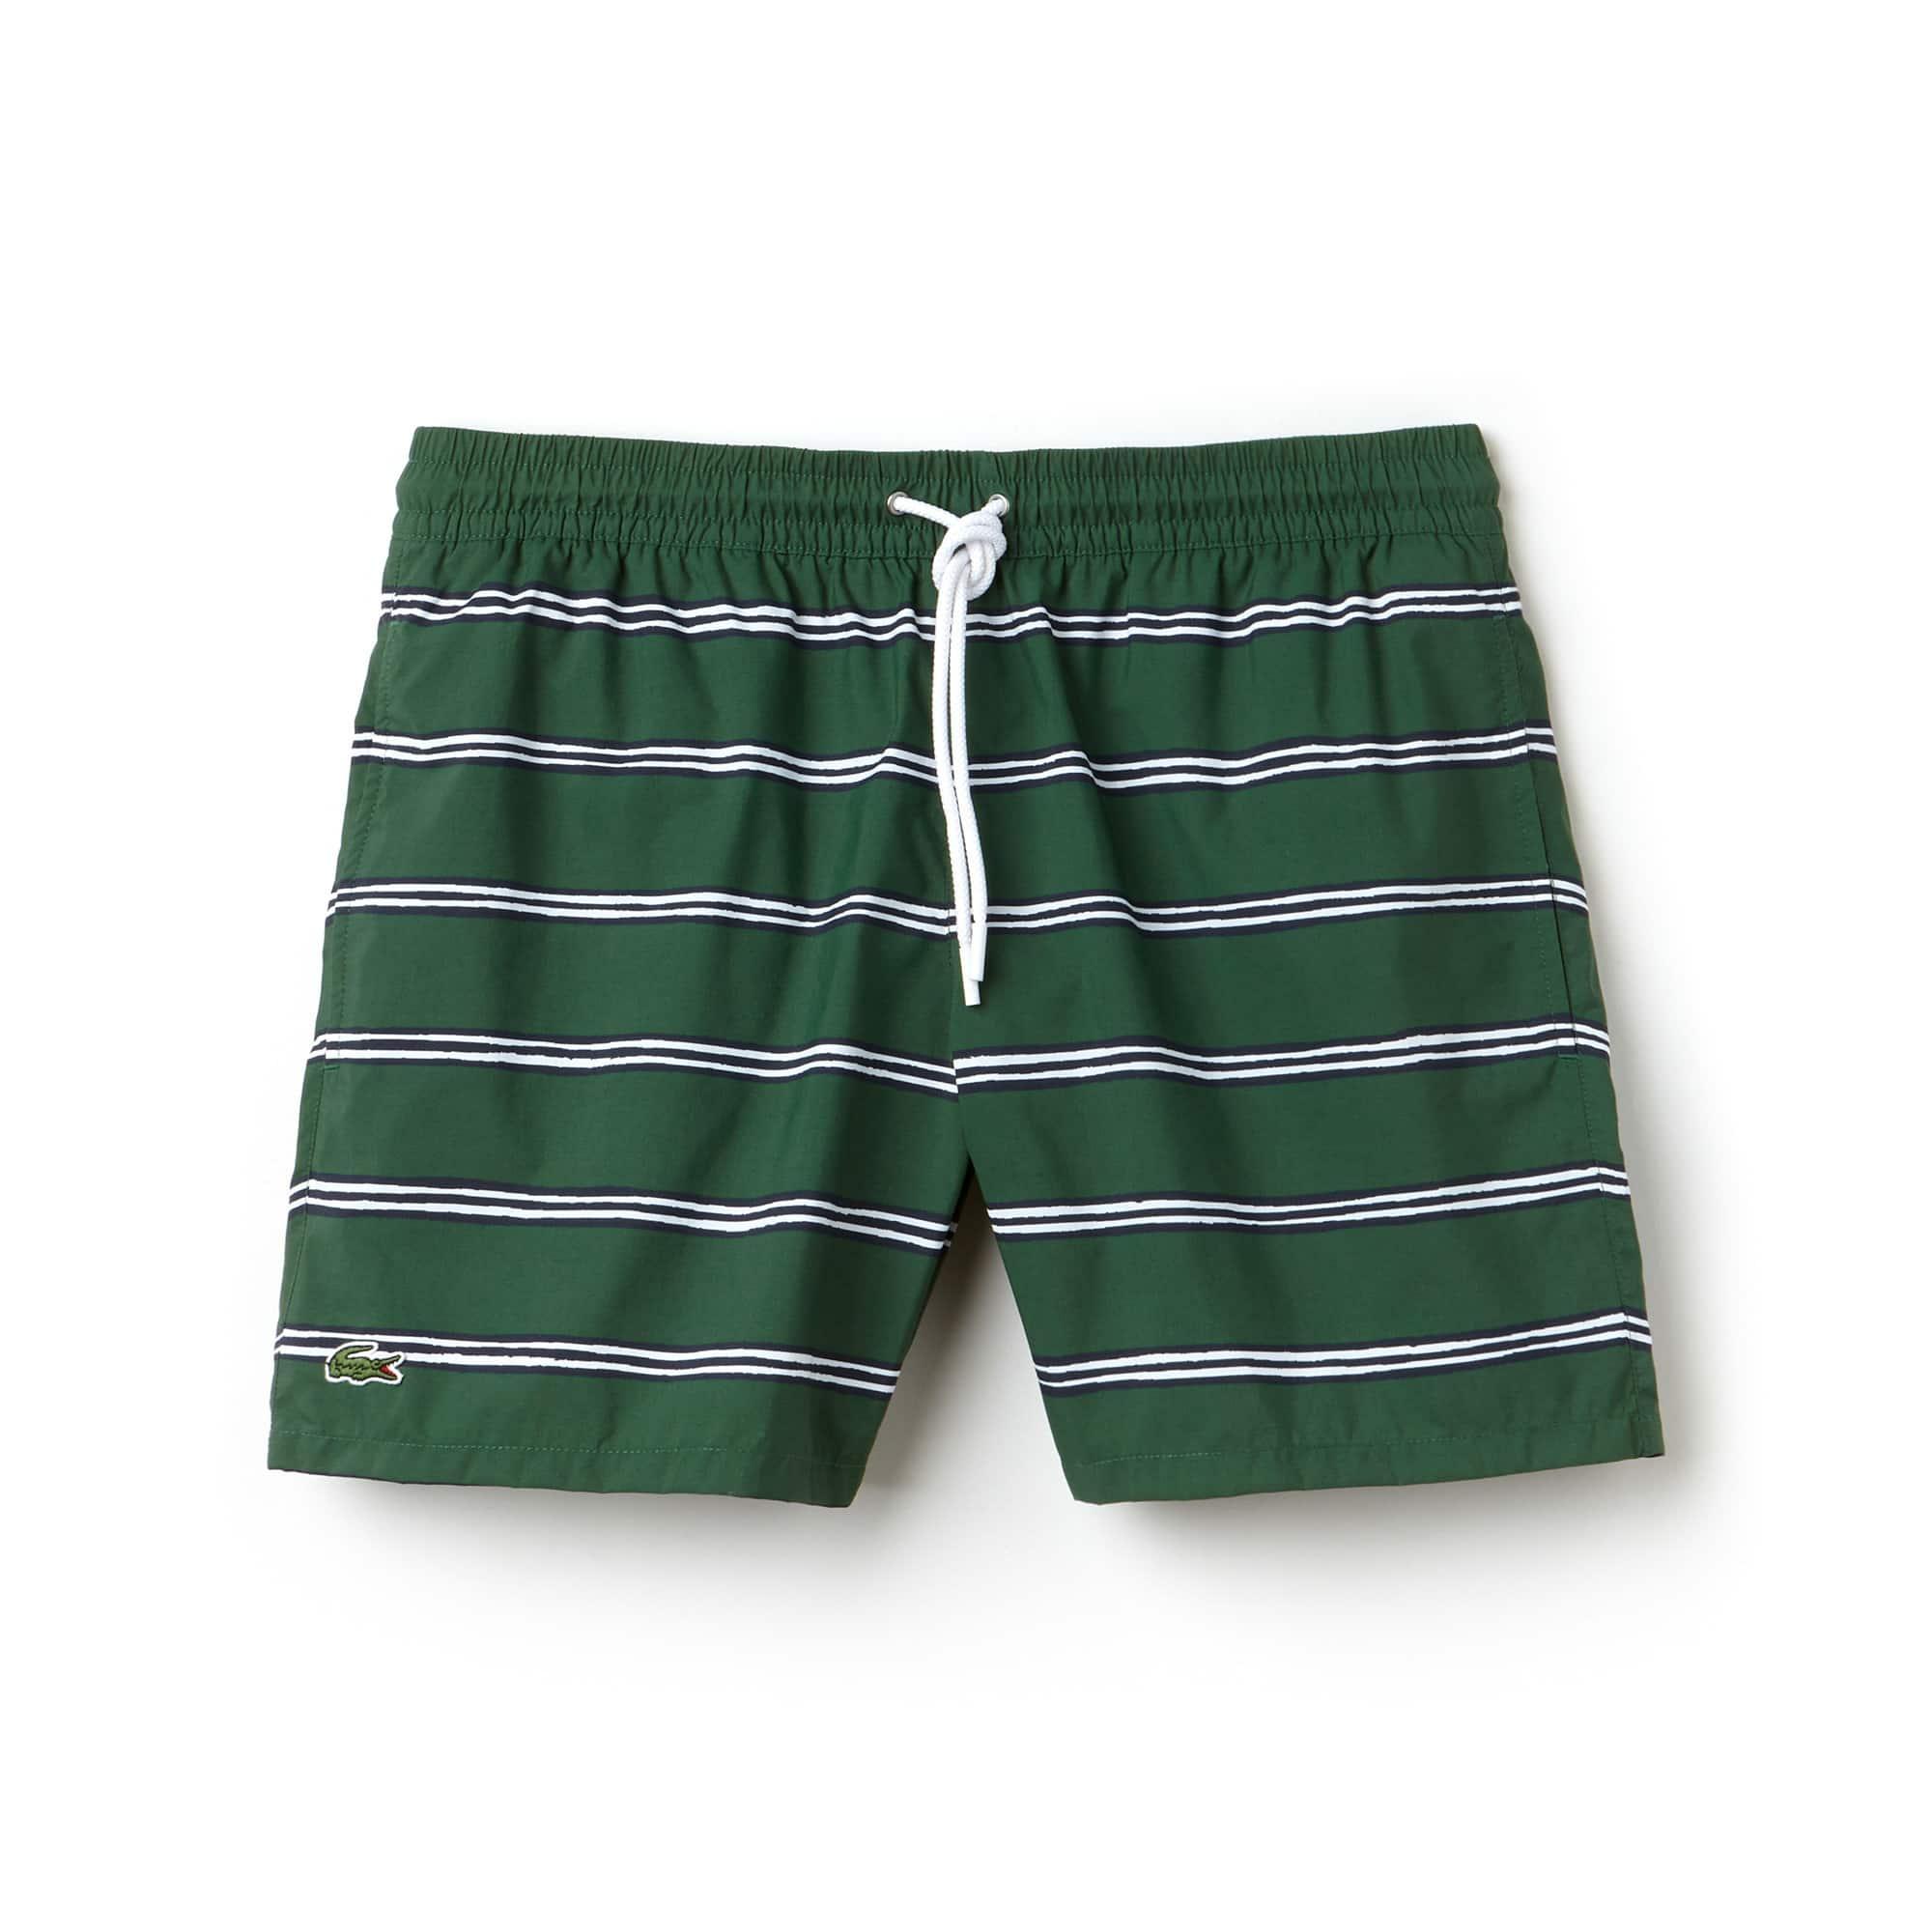 Men's Striped Canvas Swimming Trunks